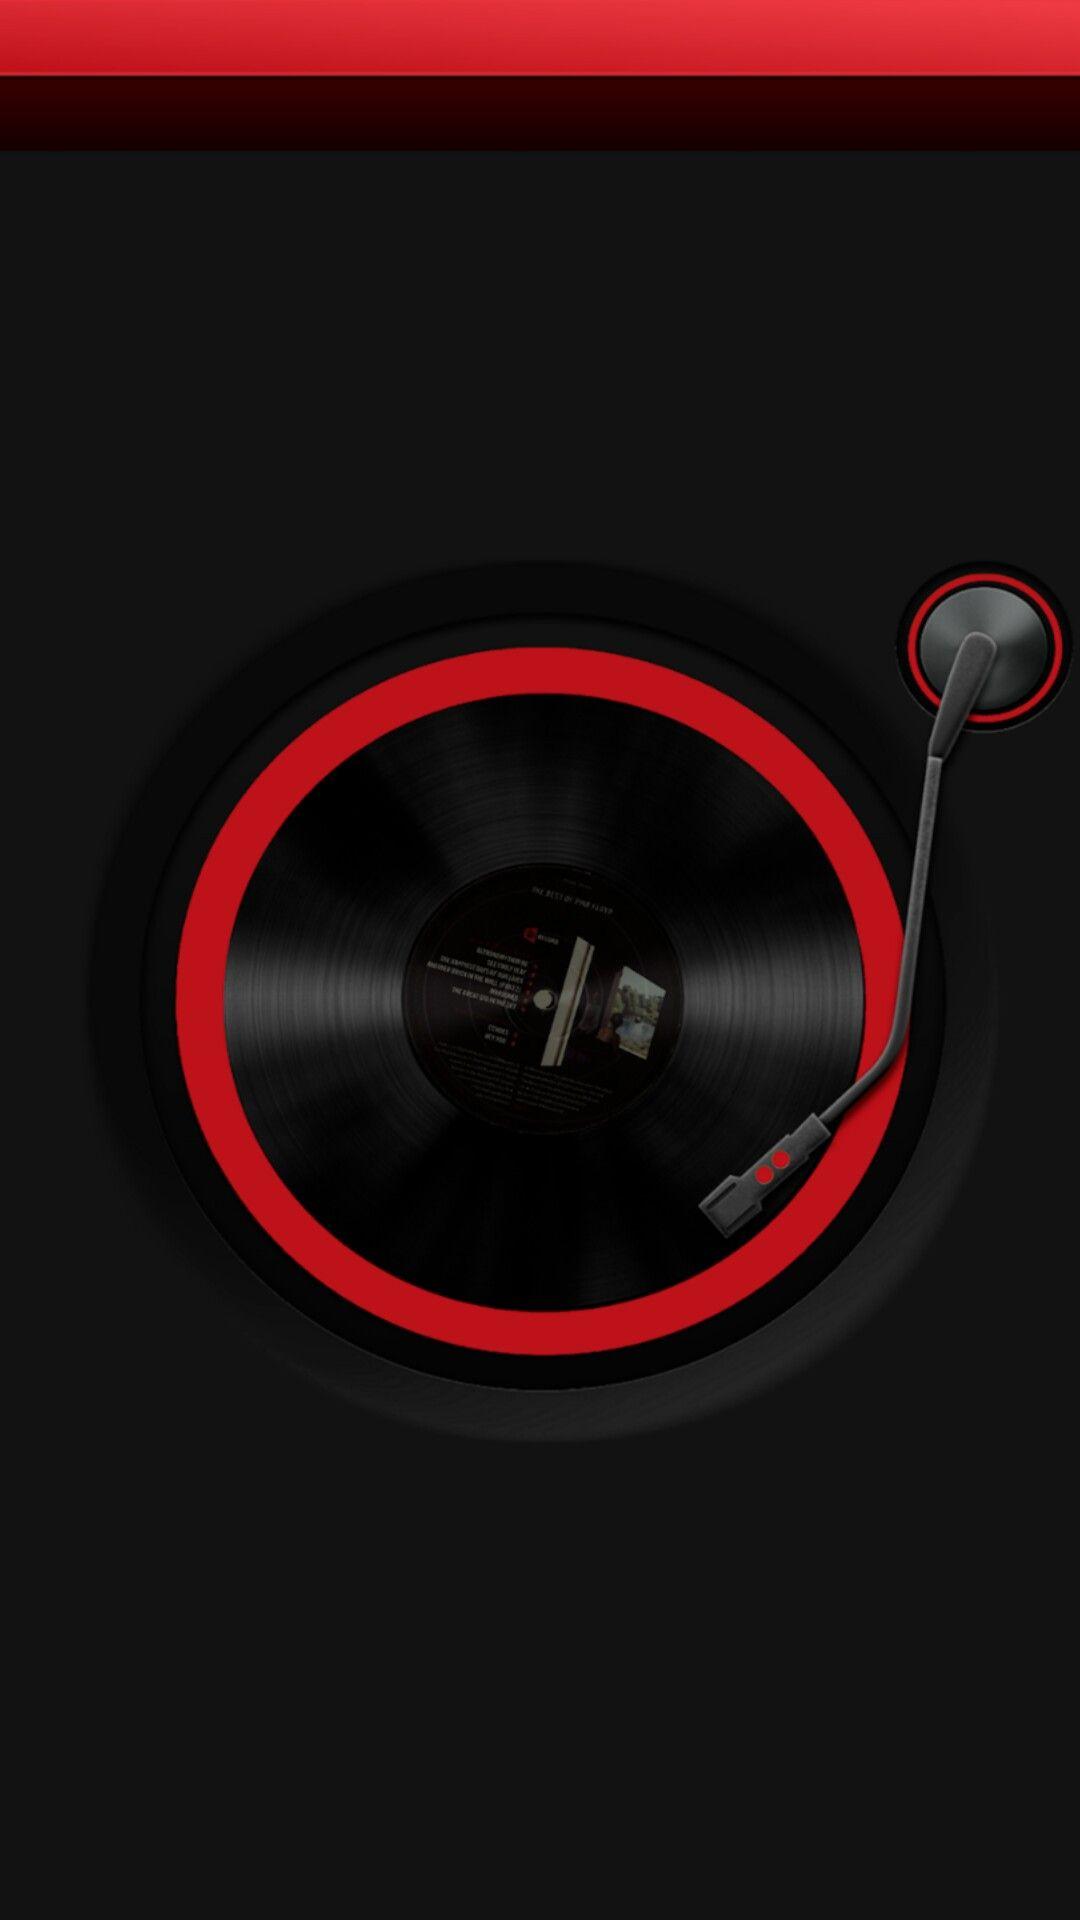 Epingle Par Herland The Strongest Sur Tlo Czarne I Czerwone Background Black And Red Fond Ecran Fond Ecran Iphone Vinyle